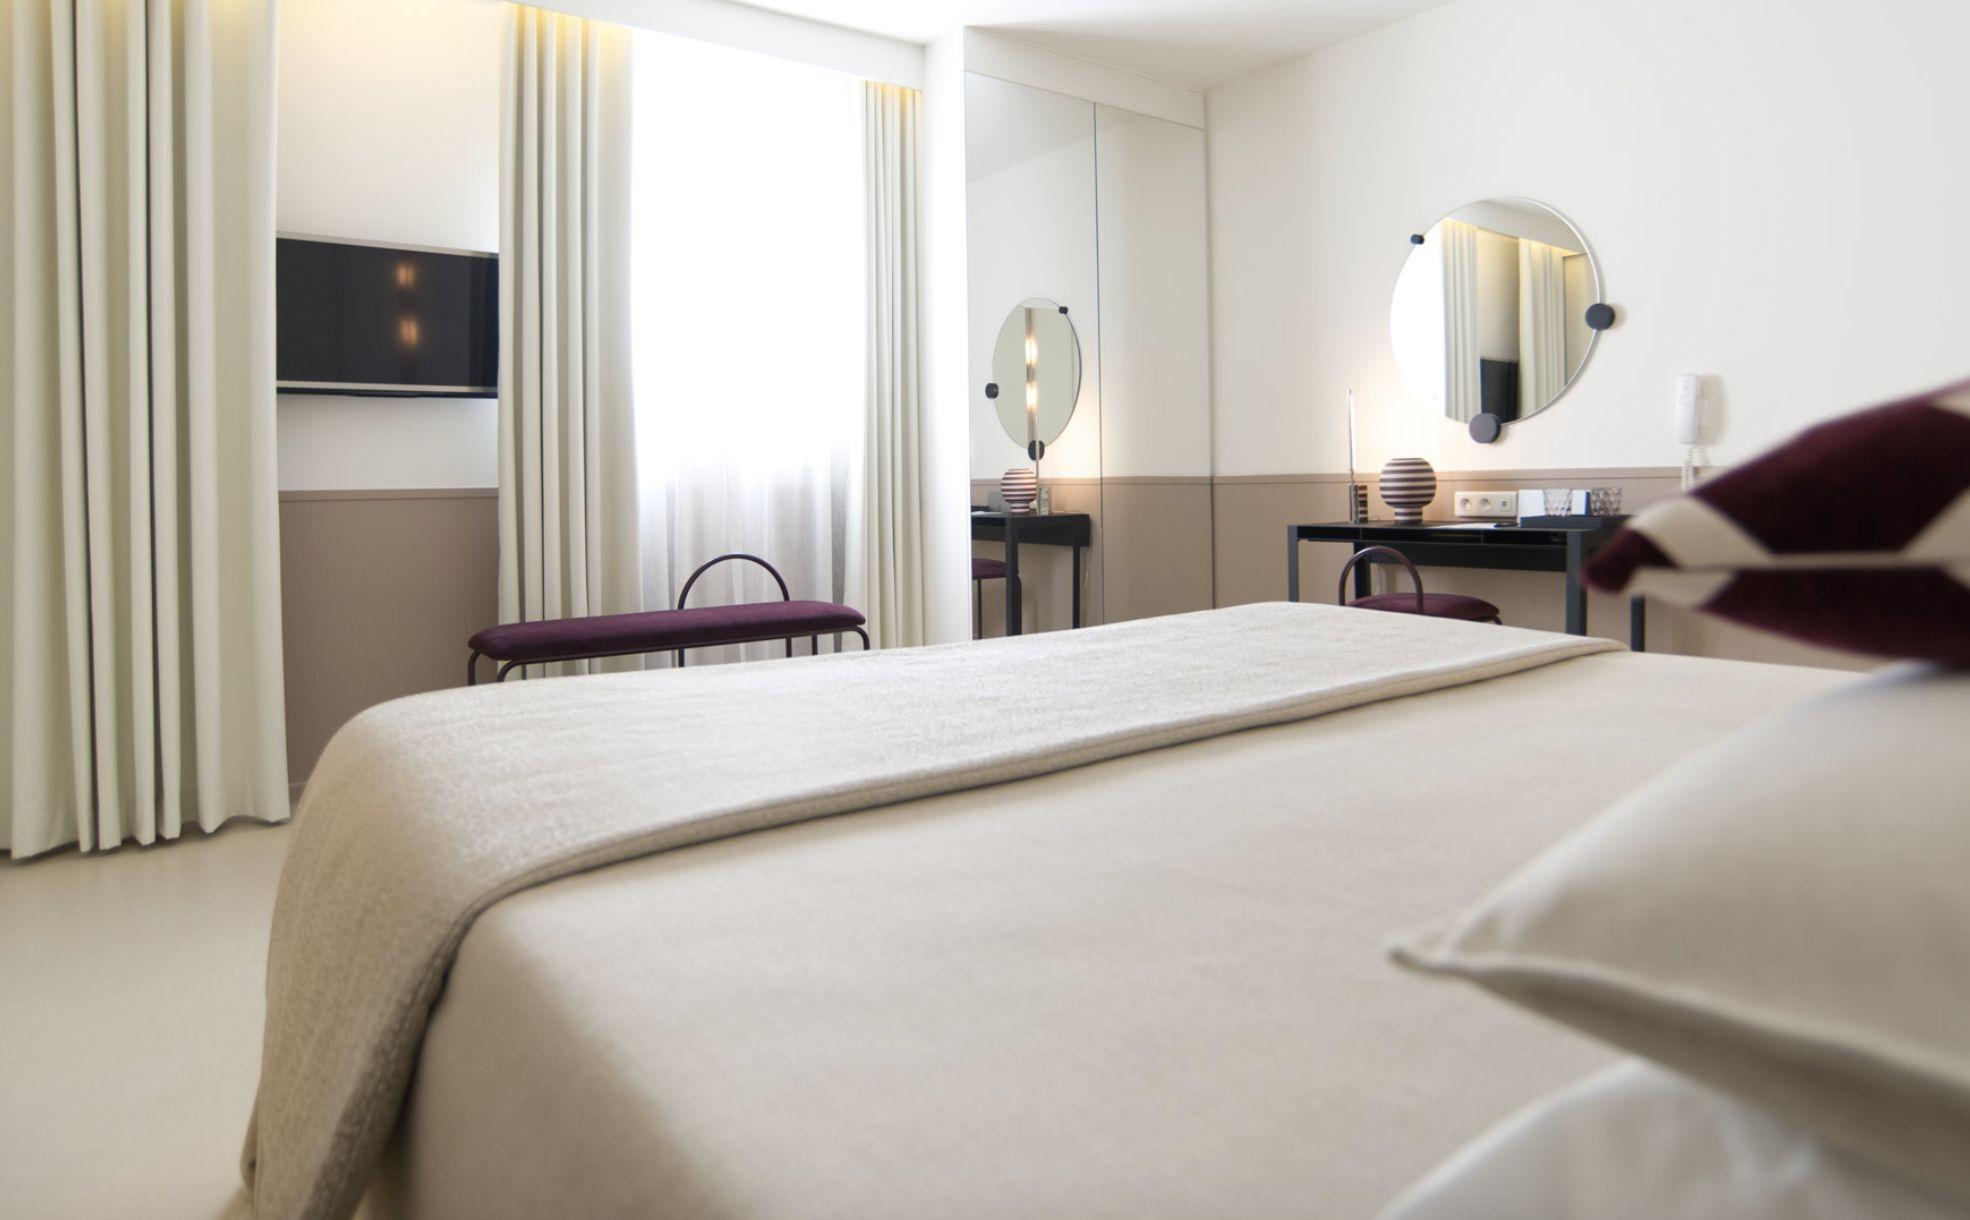 golf-expedition-golf-reizen-frankrijk-regio-corsica-hotel-genovese-stijlvol-ingericht-slaapkamer-tv